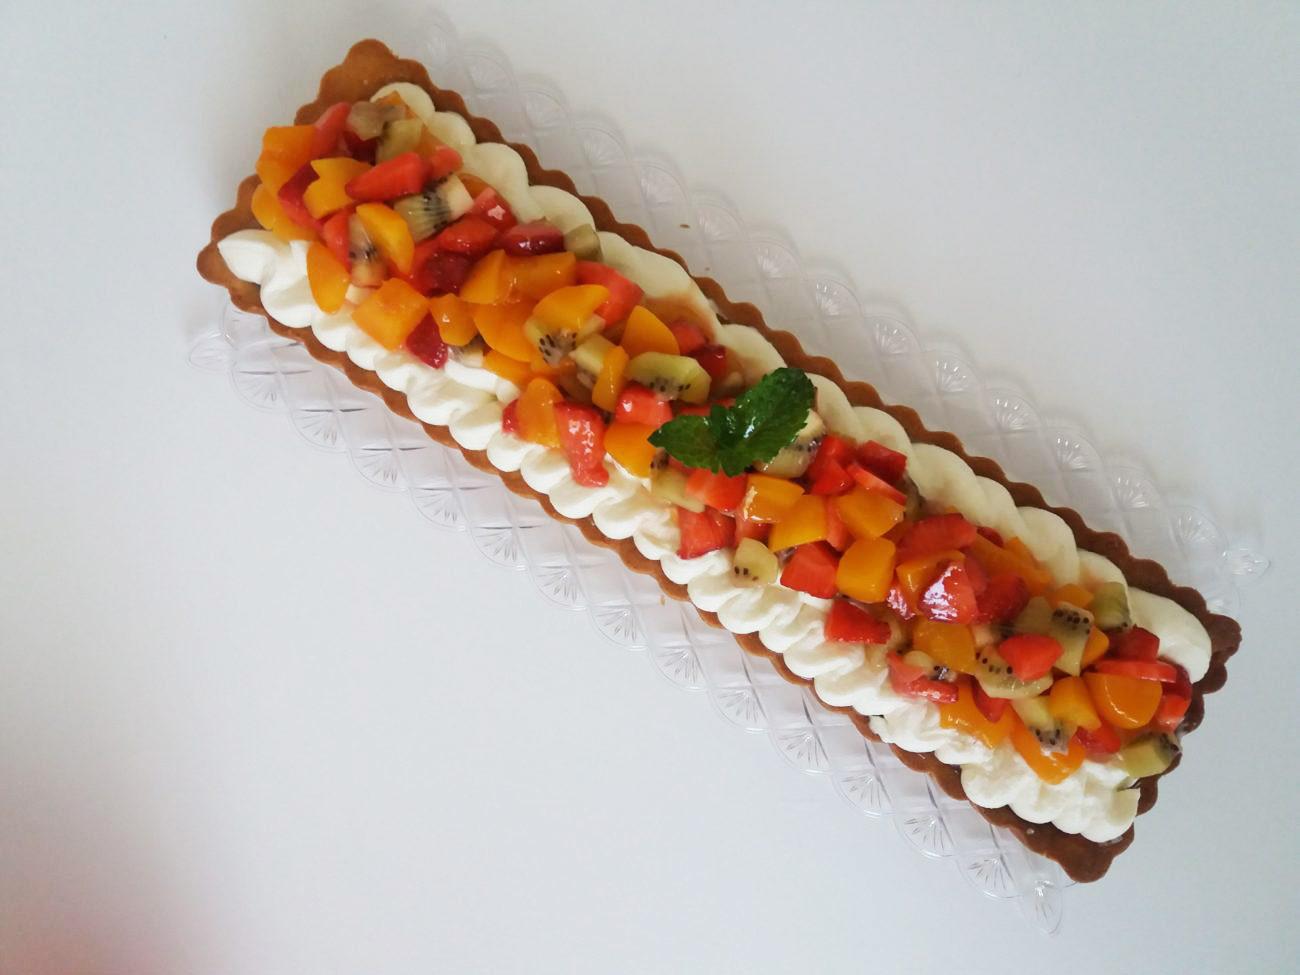 Crostata al mascarpone e salsa al kiwi